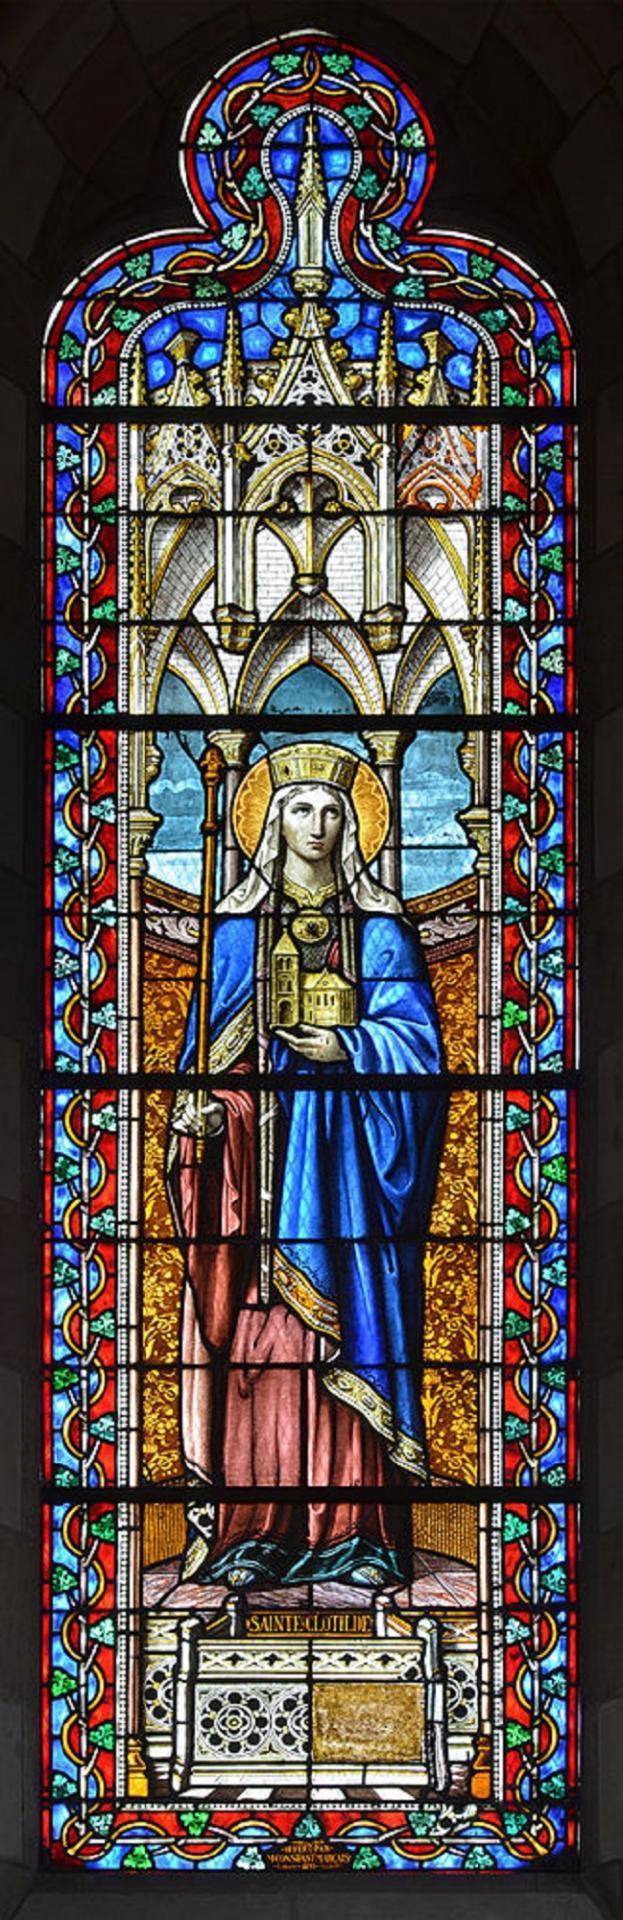 Sainte clotilde reine des francs 11